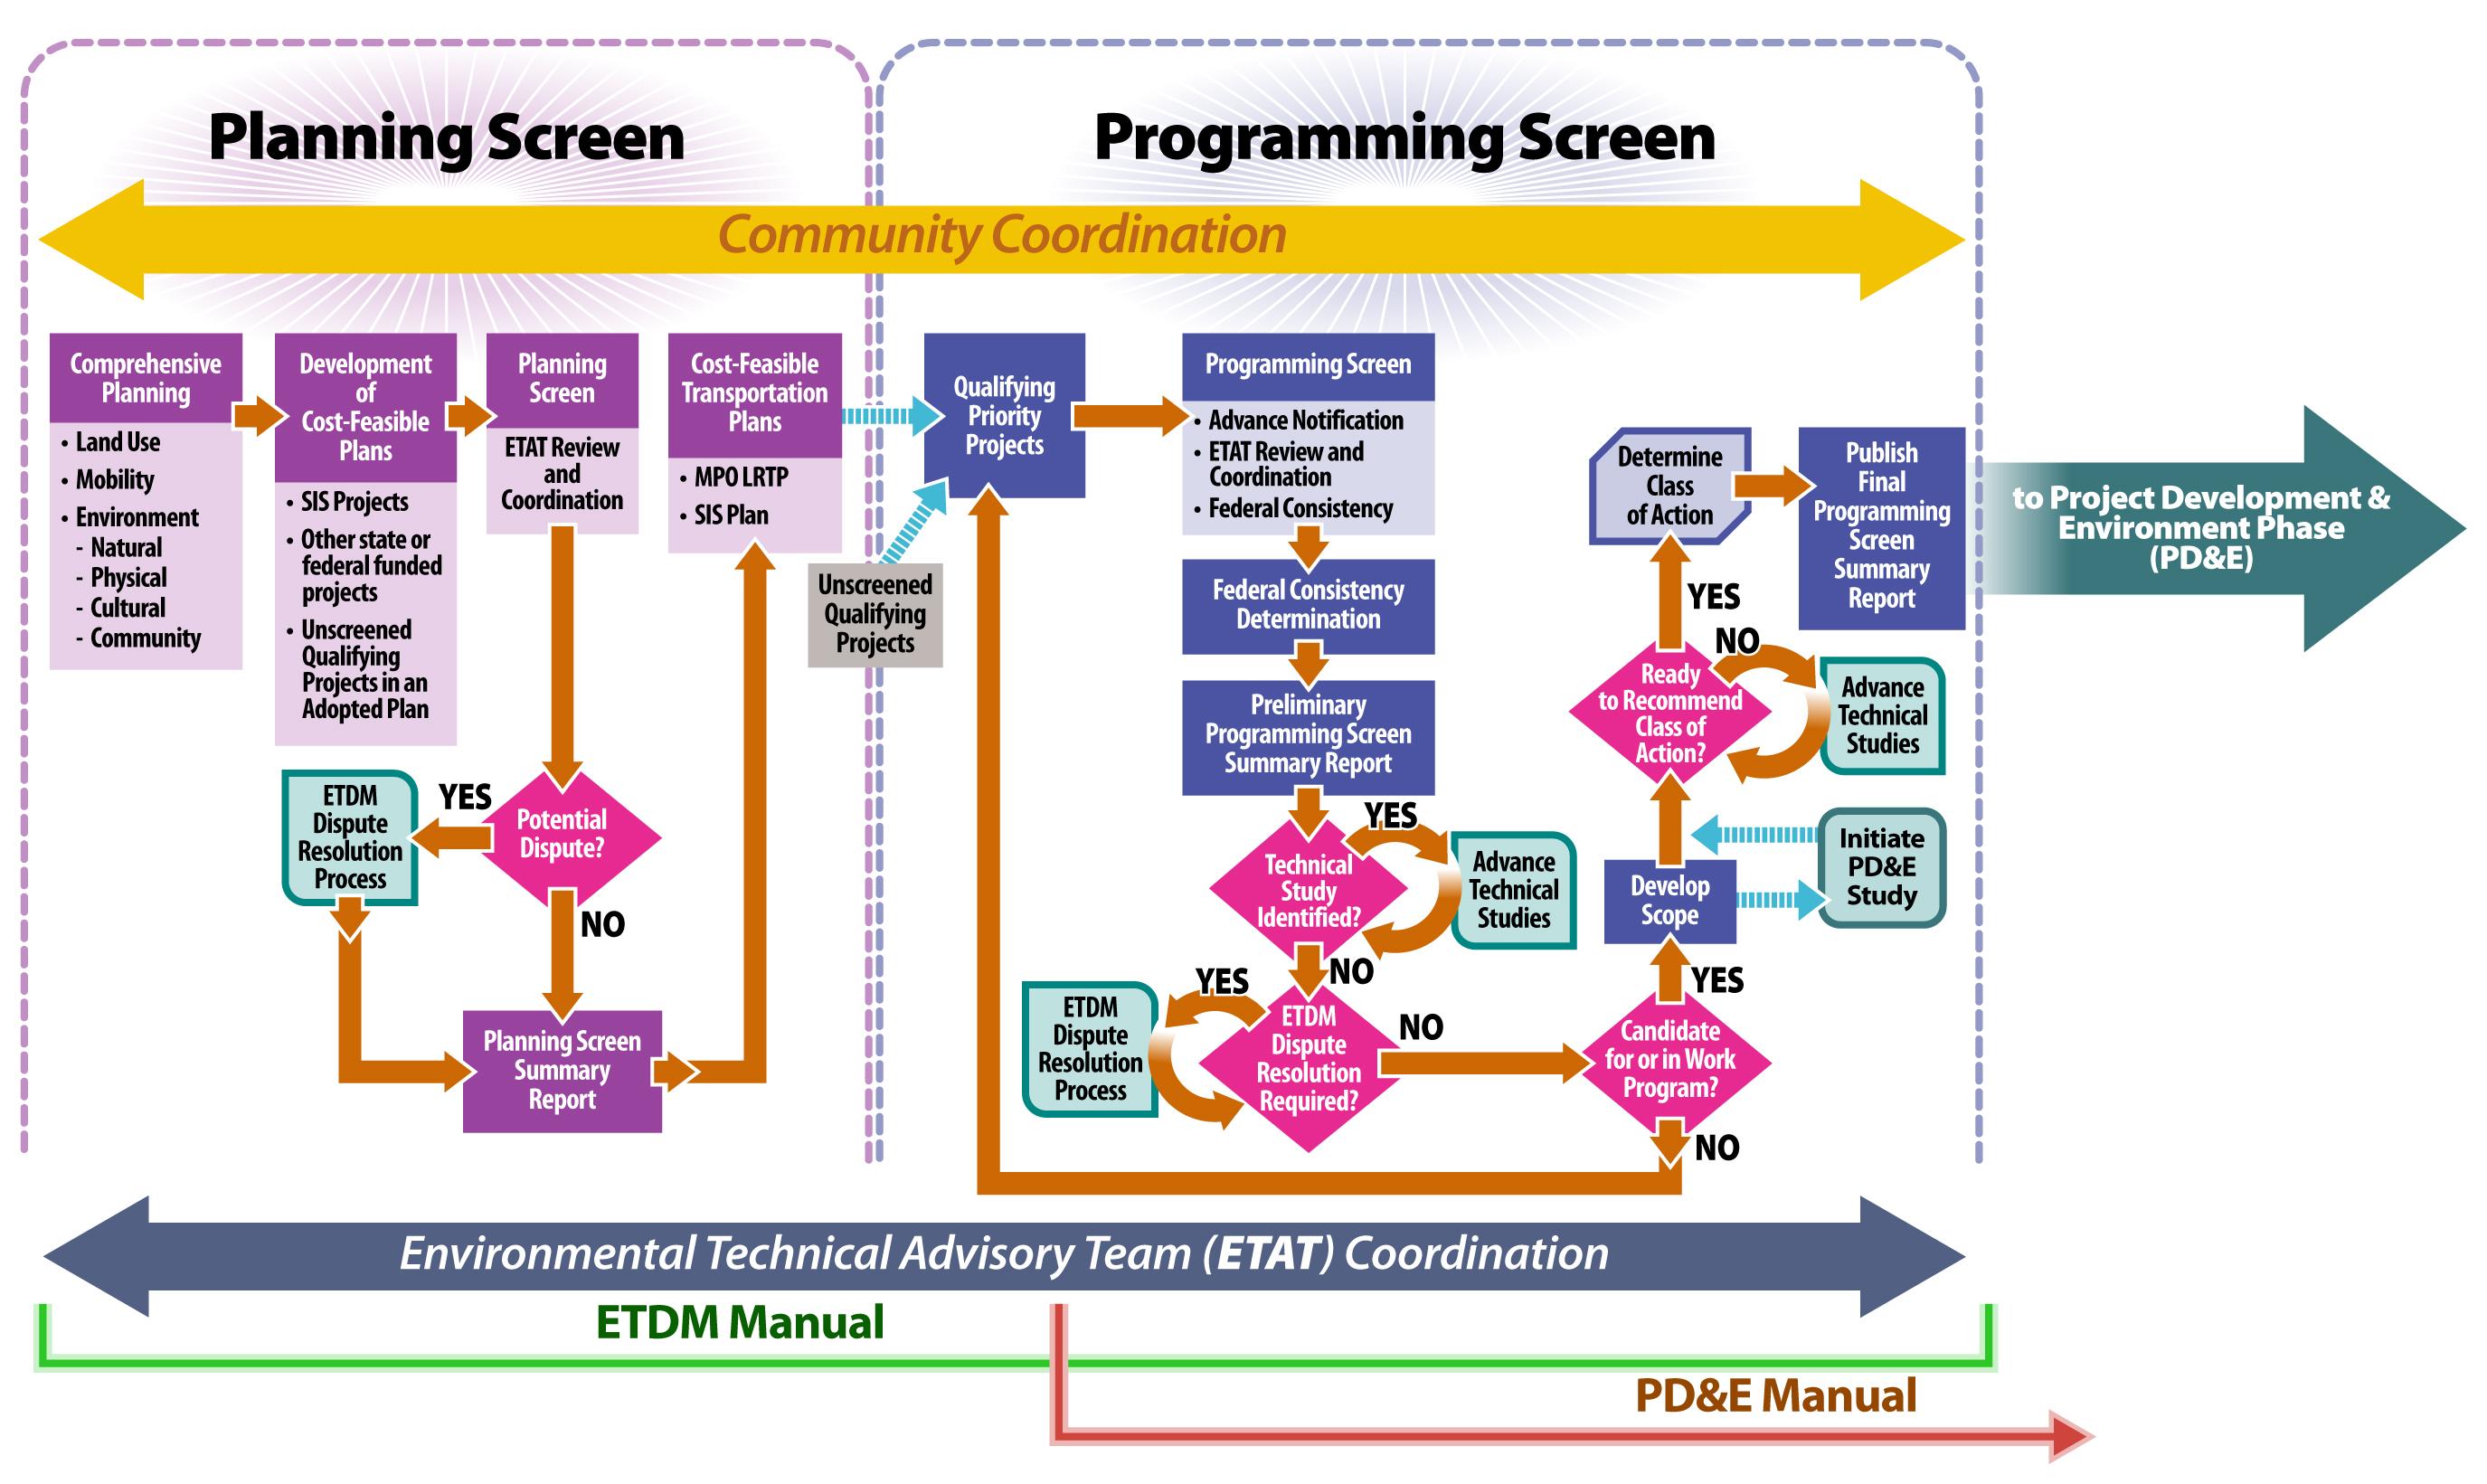 FDOT Efficient Transportation Decision Making (ETDM)